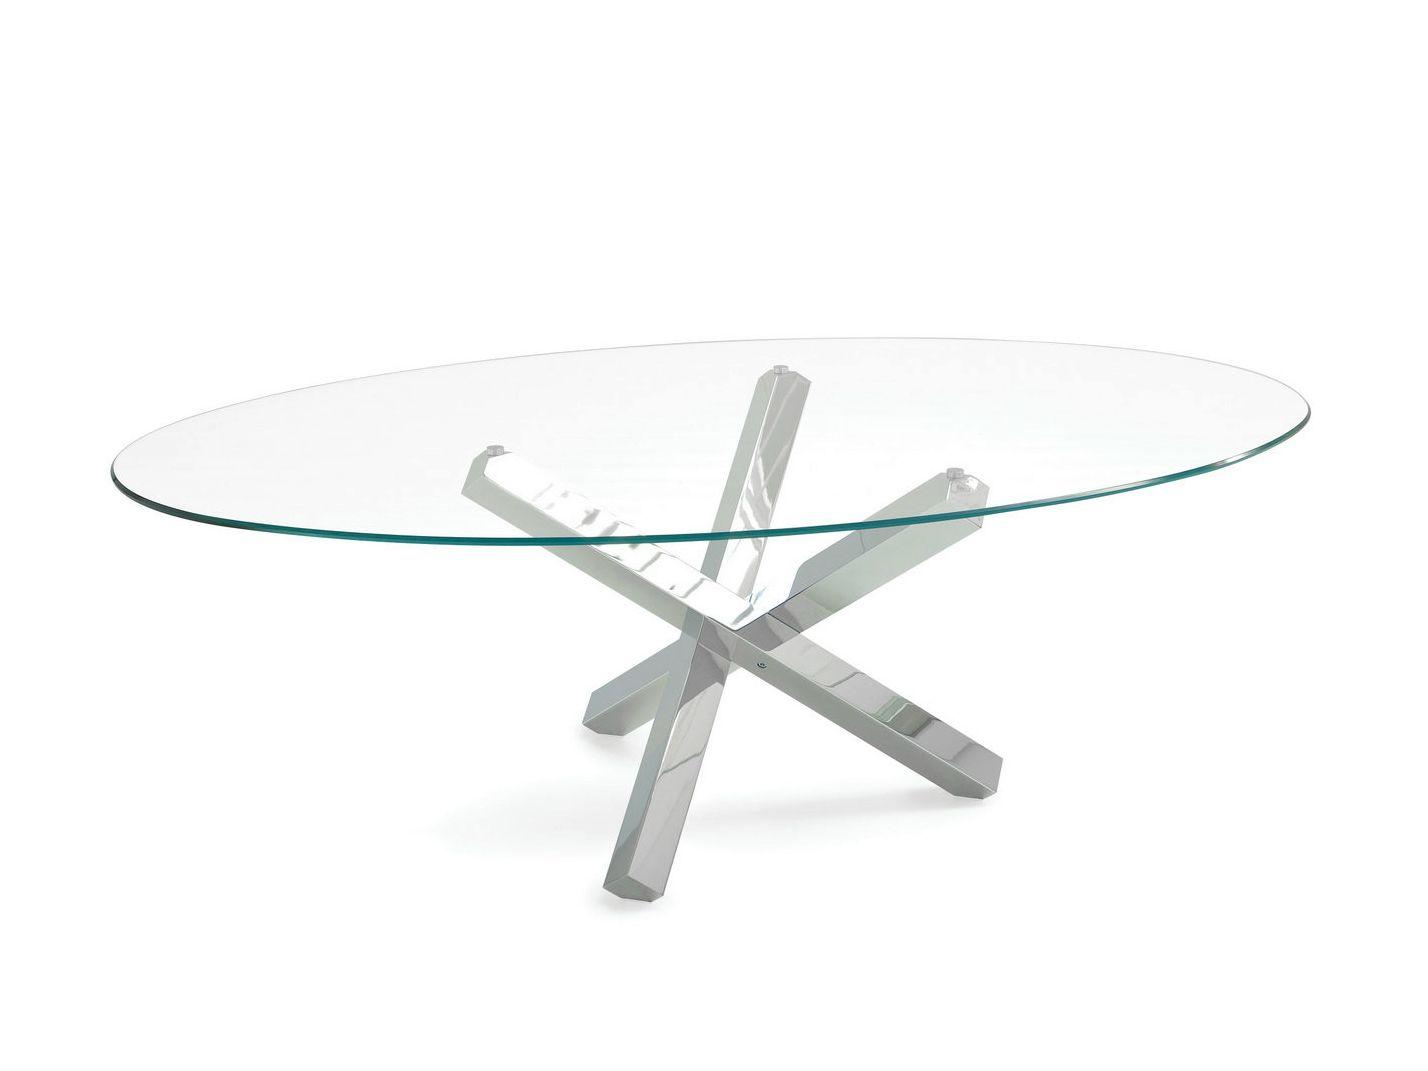 Tavolo ovale in vetro AIKIDO ELLIPTICAL By Sovet italia